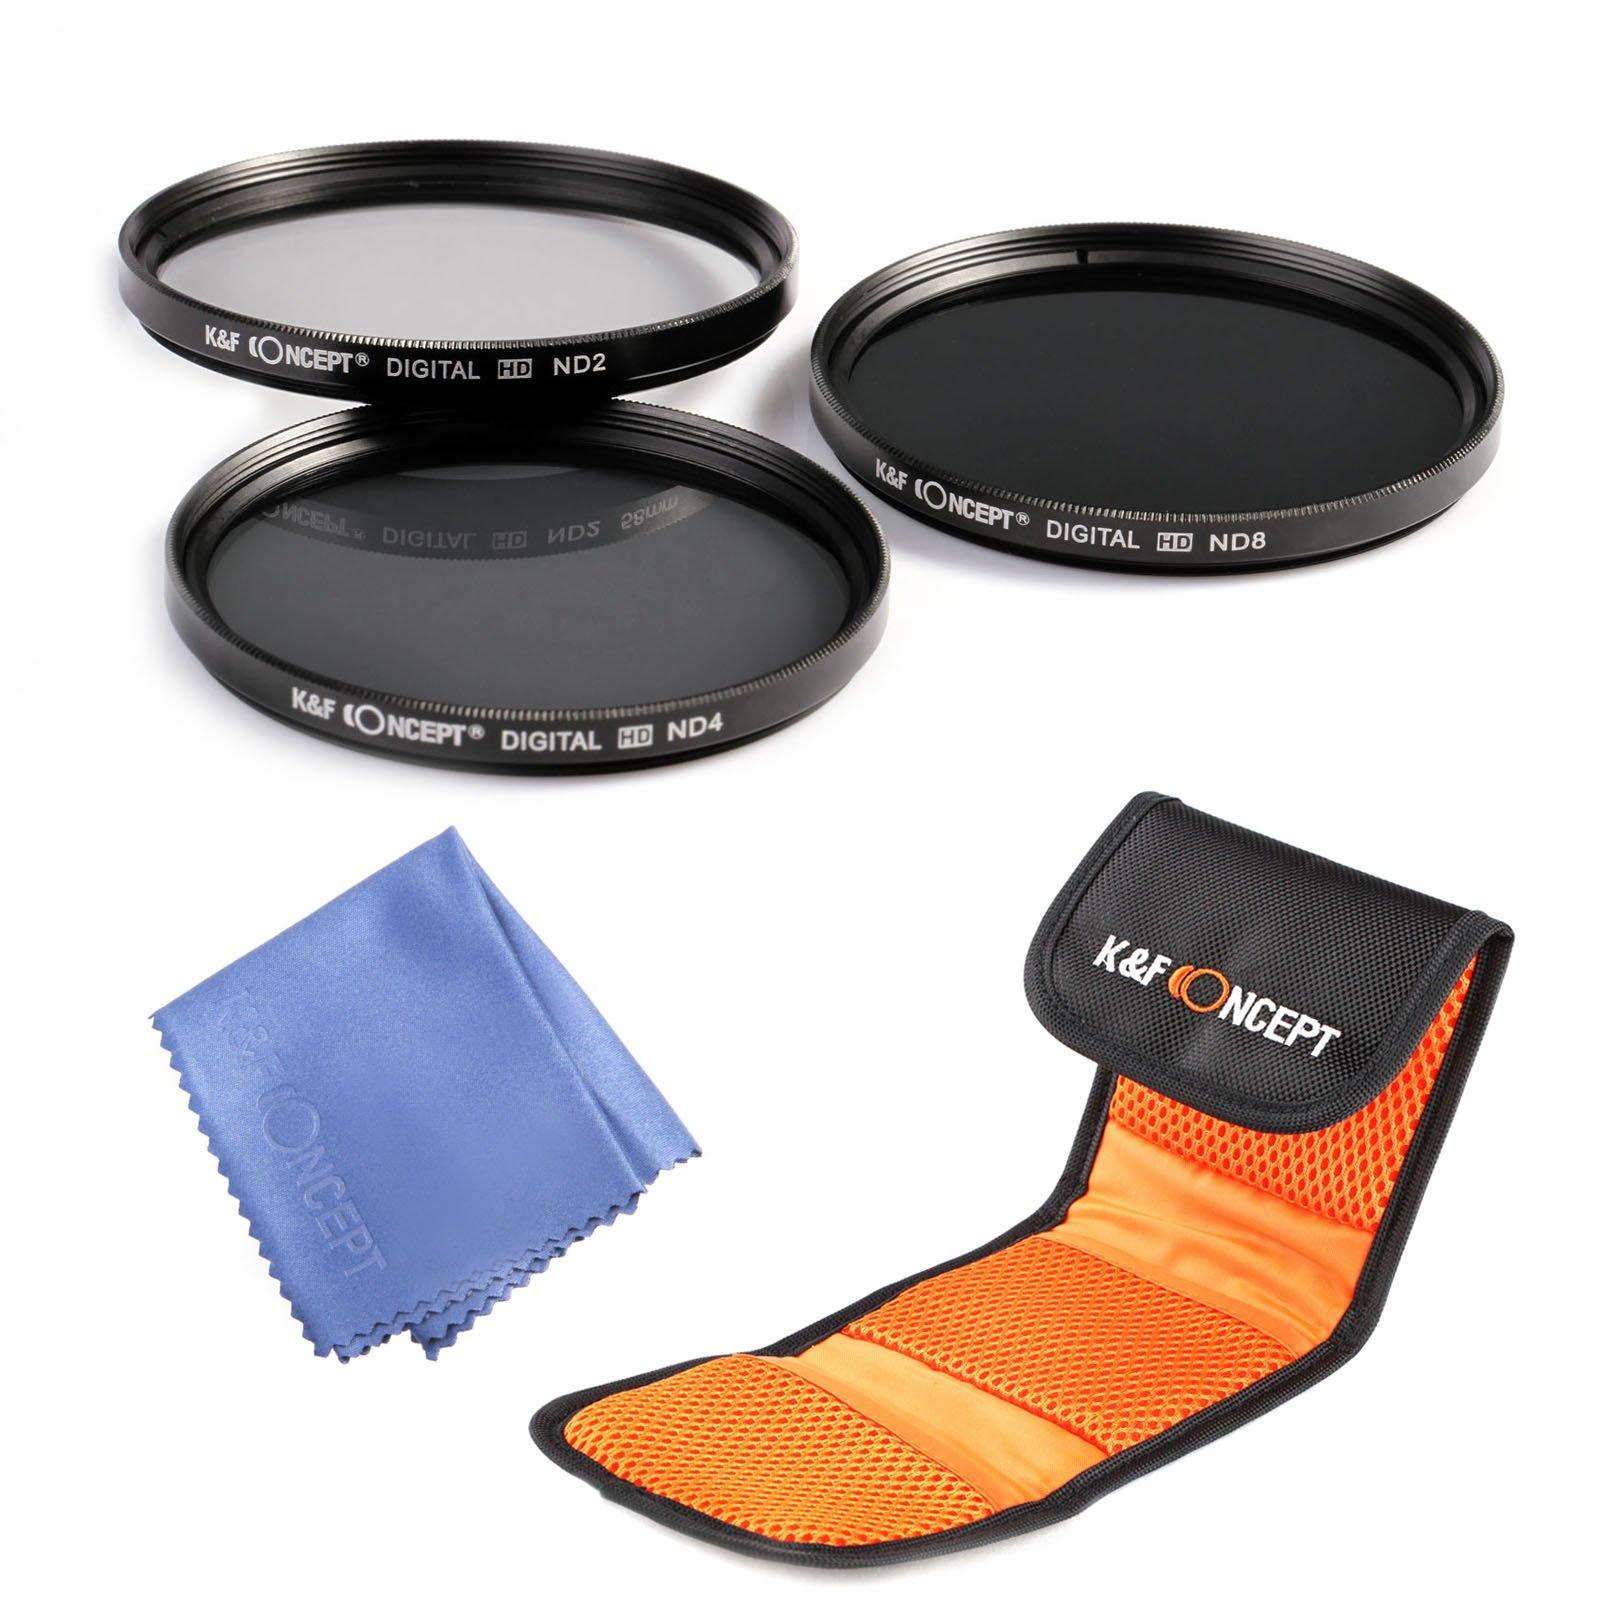 K&F Concept 52mm Lens Filter Kit Neutral Density ND Filter Set ND2 ND4 ND8 for Nikon Canon DSLR Cameras + Filter Pouch